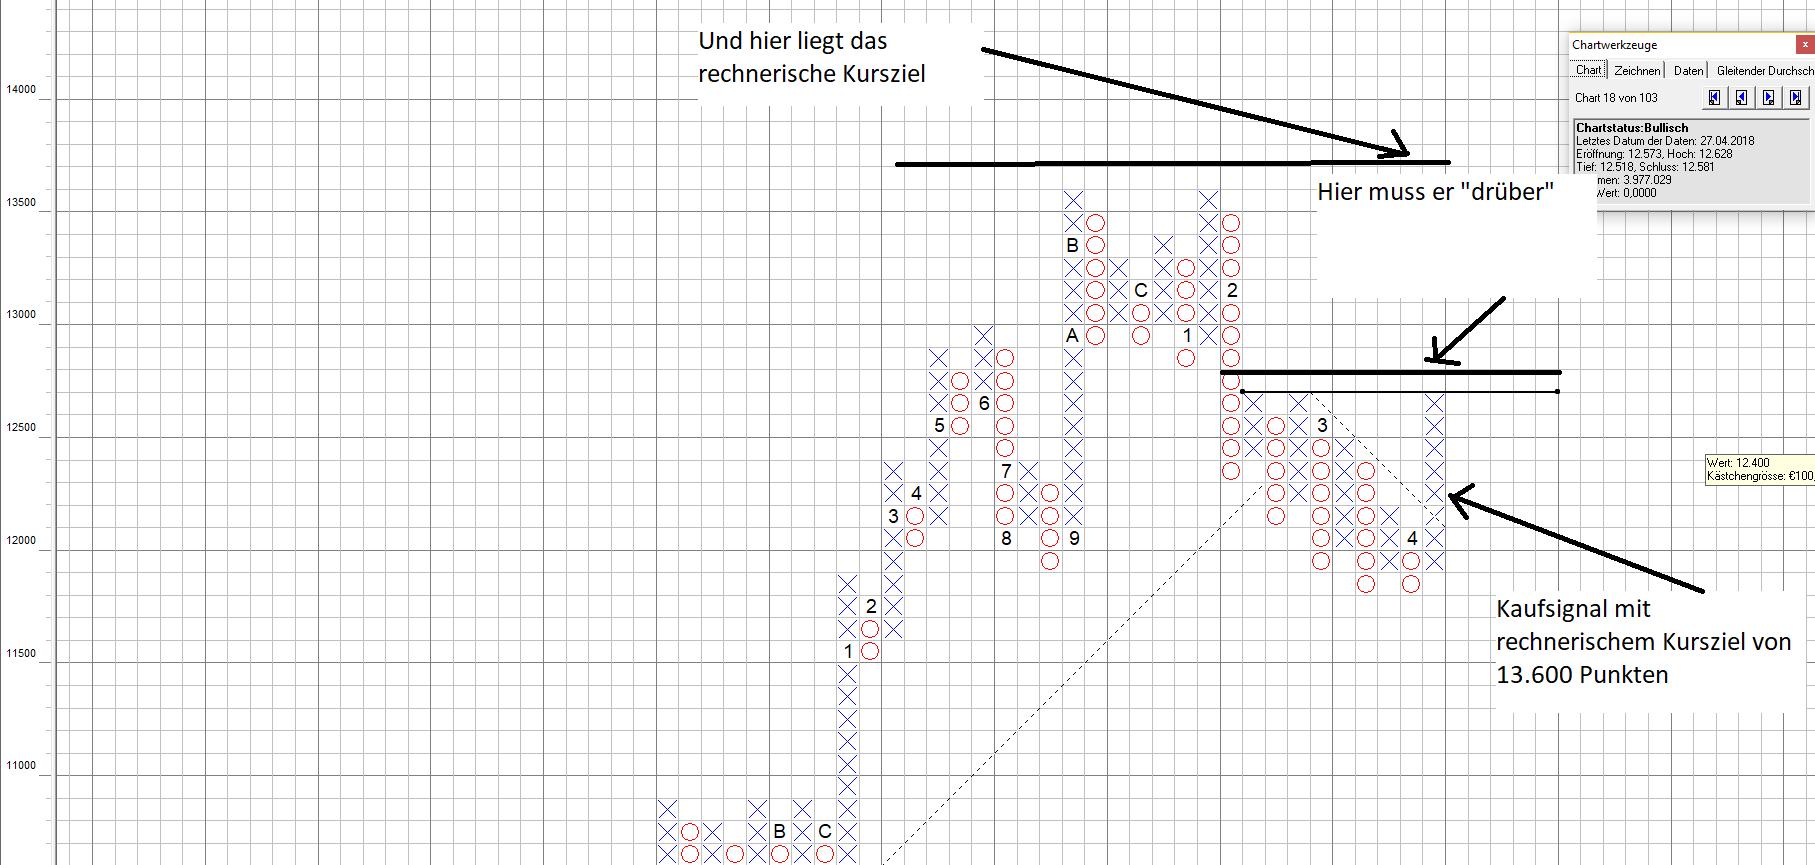 DAX stößt sich weiter heftig den Kopf an im P&F Chart